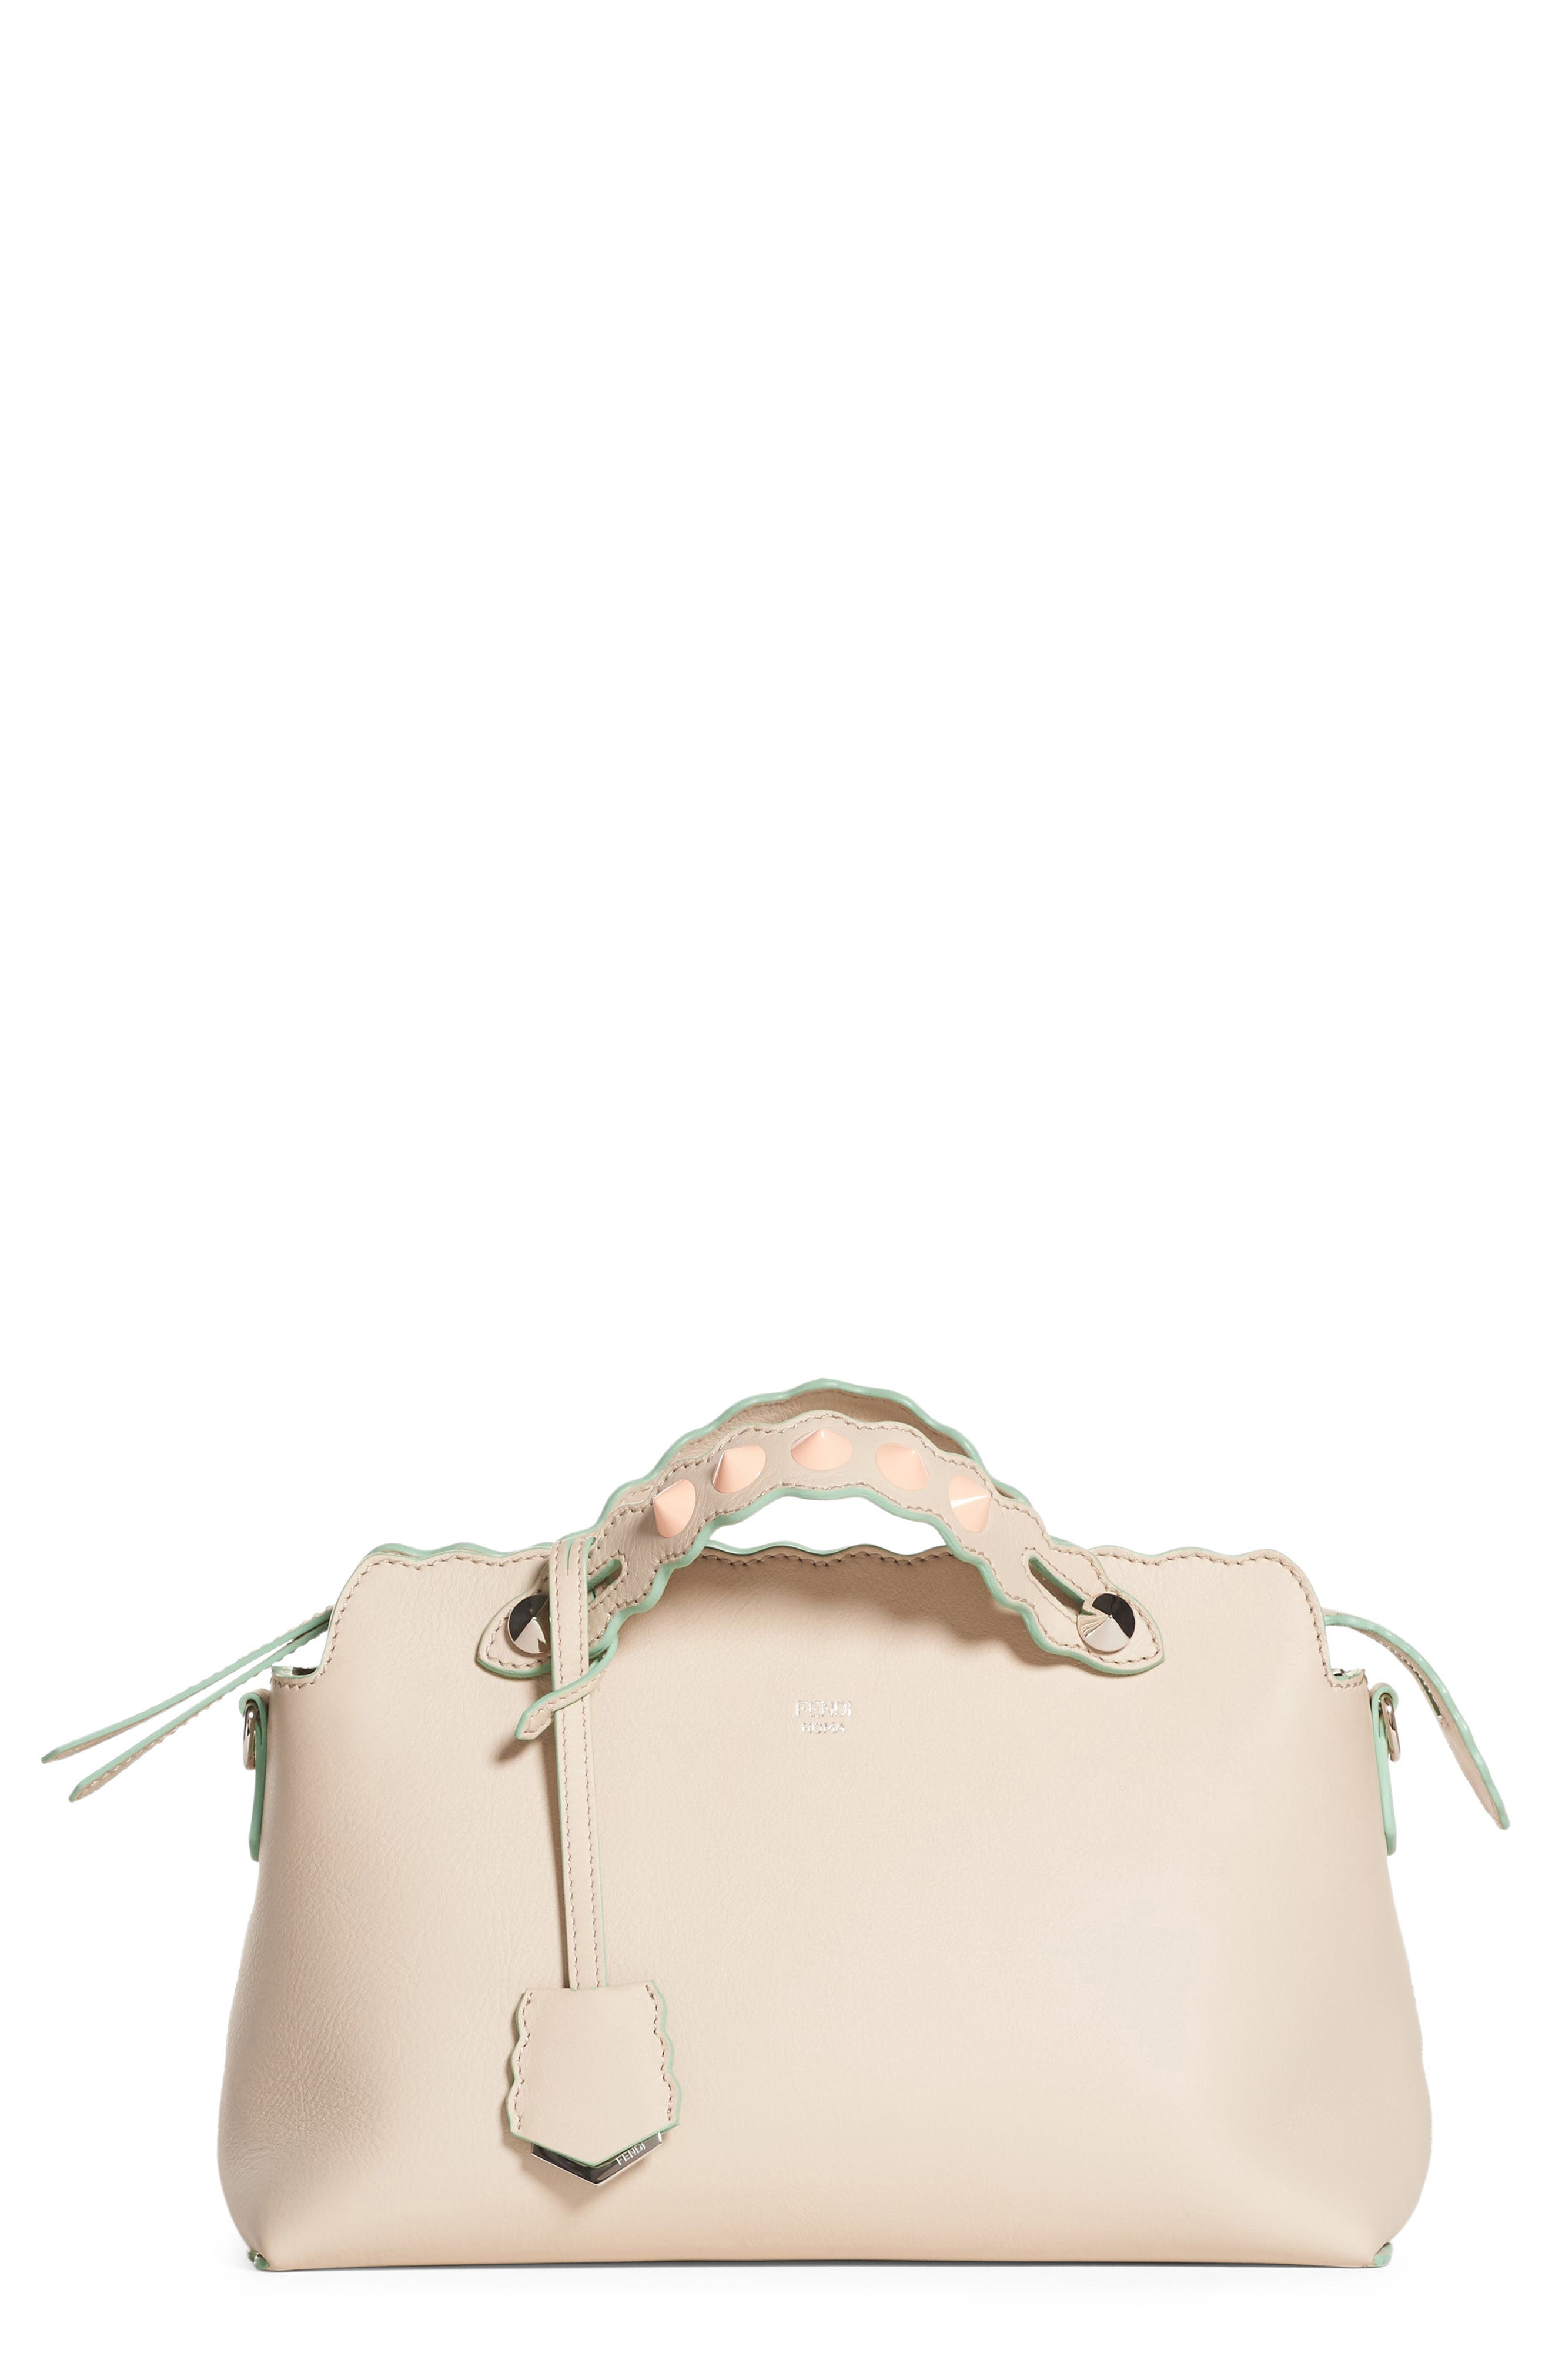 Fendi Medium By The Way Leather Shoulder Bag